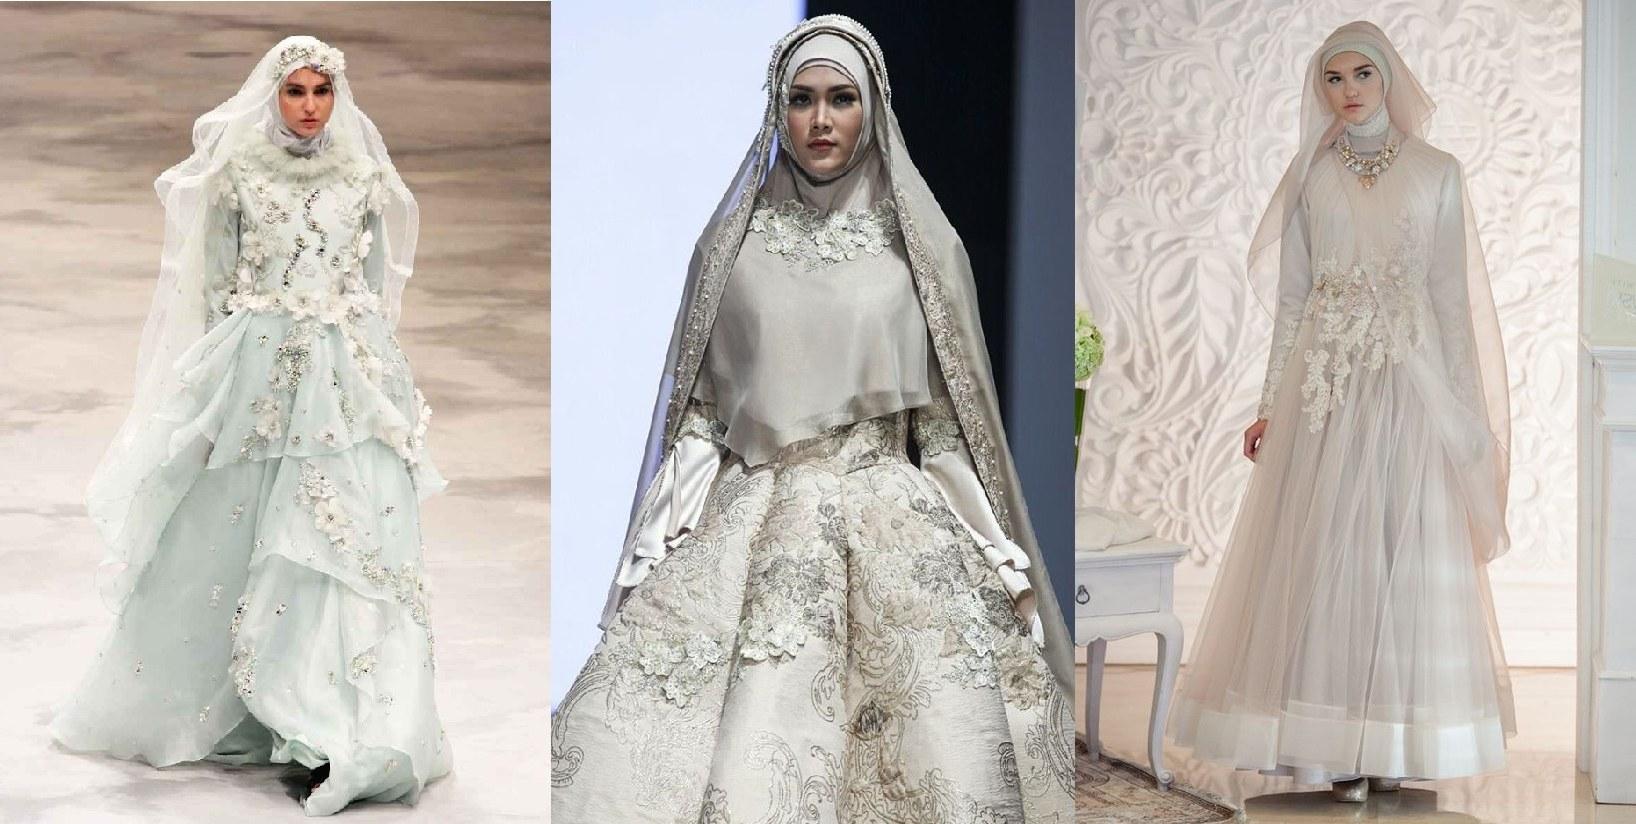 Model Baju Pengantin Muslimah Syar'i Ipdd Gaun Pengantin Muslim Syar I Inspirasi Pernikahan